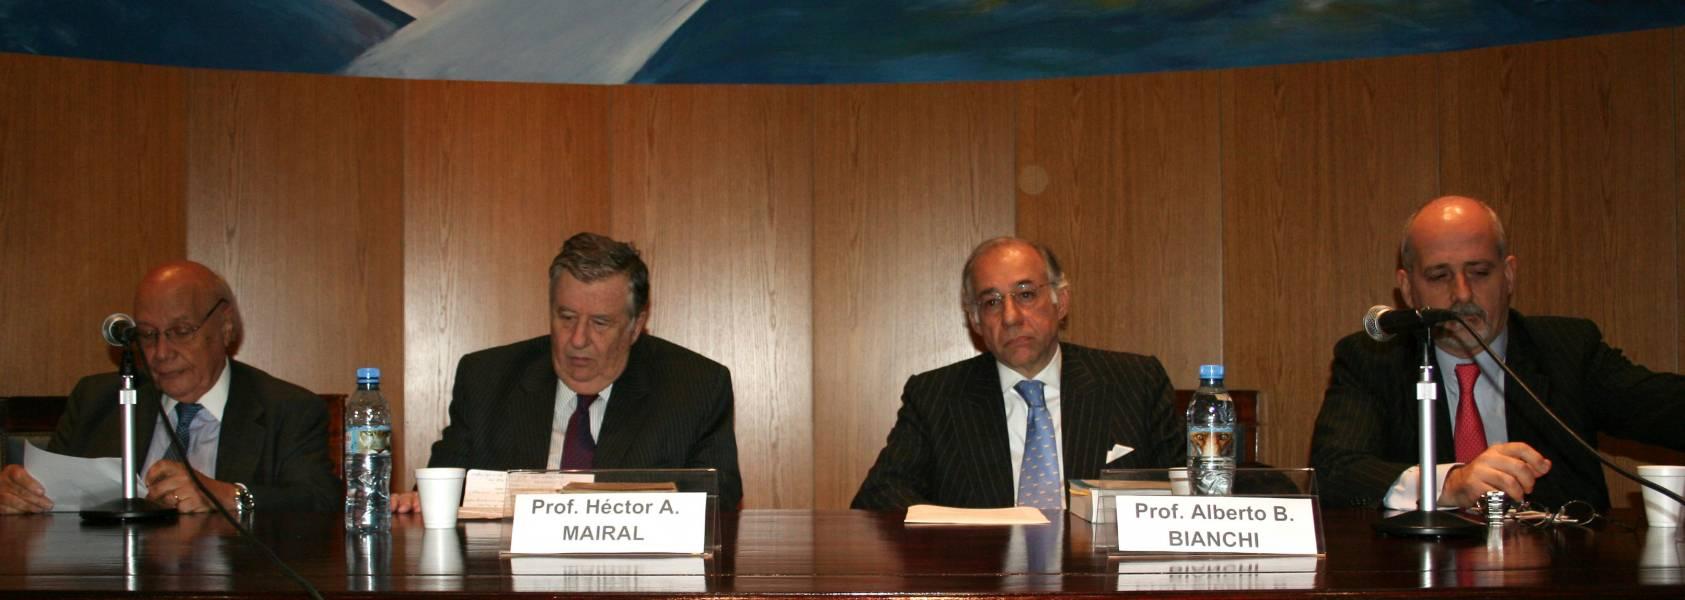 Juan Carlos Cassagne, Héctor A. Mairal, Alberto B. Bianchi y Guido S. Tawil